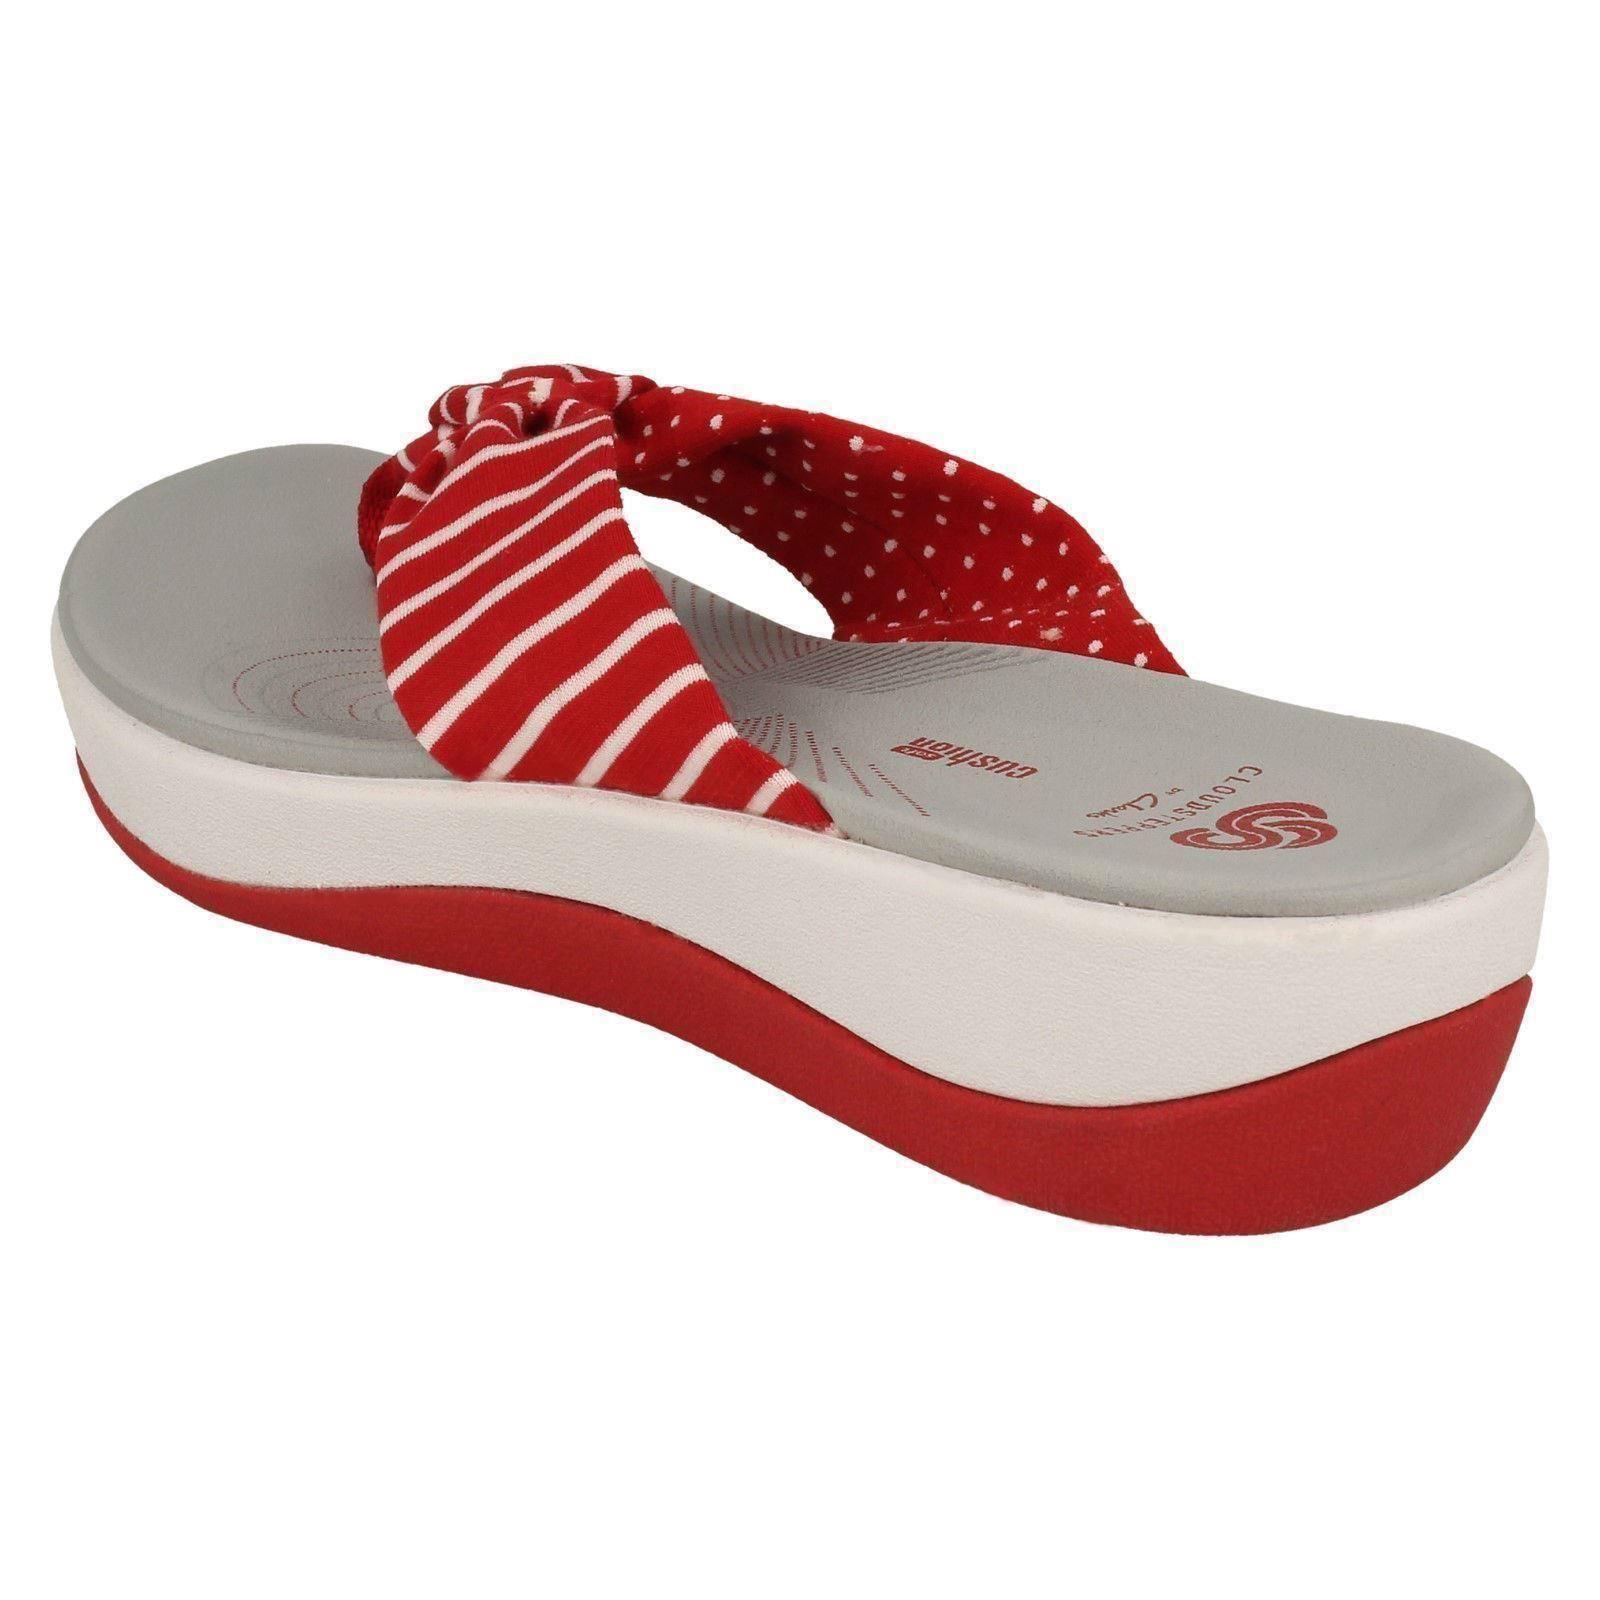 Ladies Clarks Toe Post Cloudsteppers Cloudsteppers Cloudsteppers Sandals Arla Glison 18 a78d4f